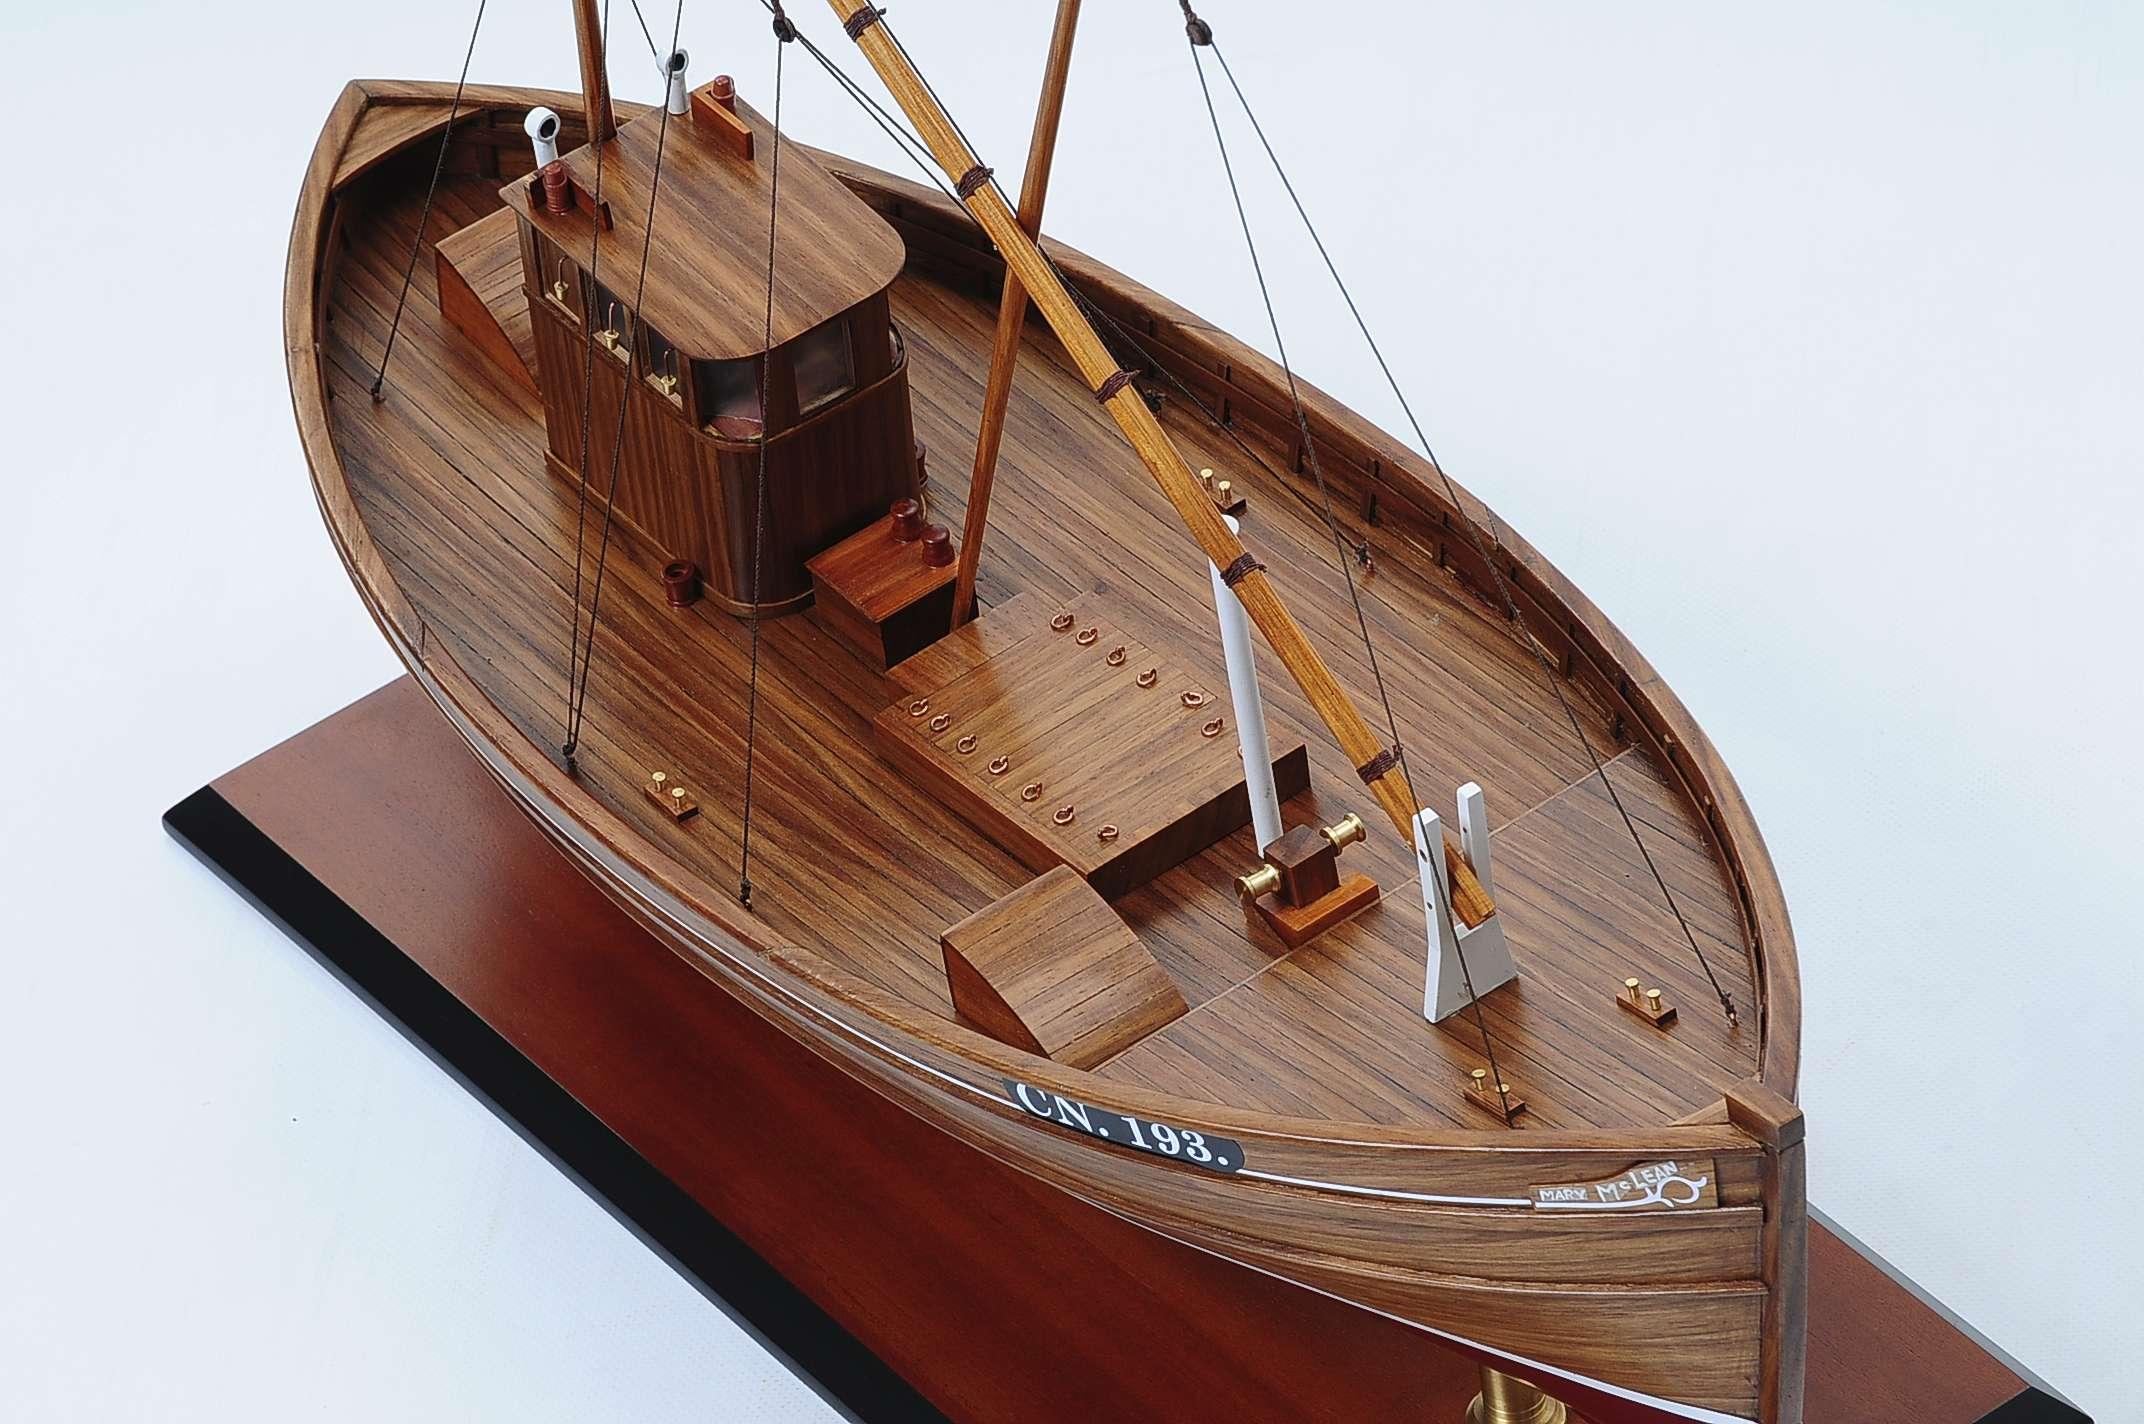 1431-4551-Mary-Mclean-CN193-Model-Boat